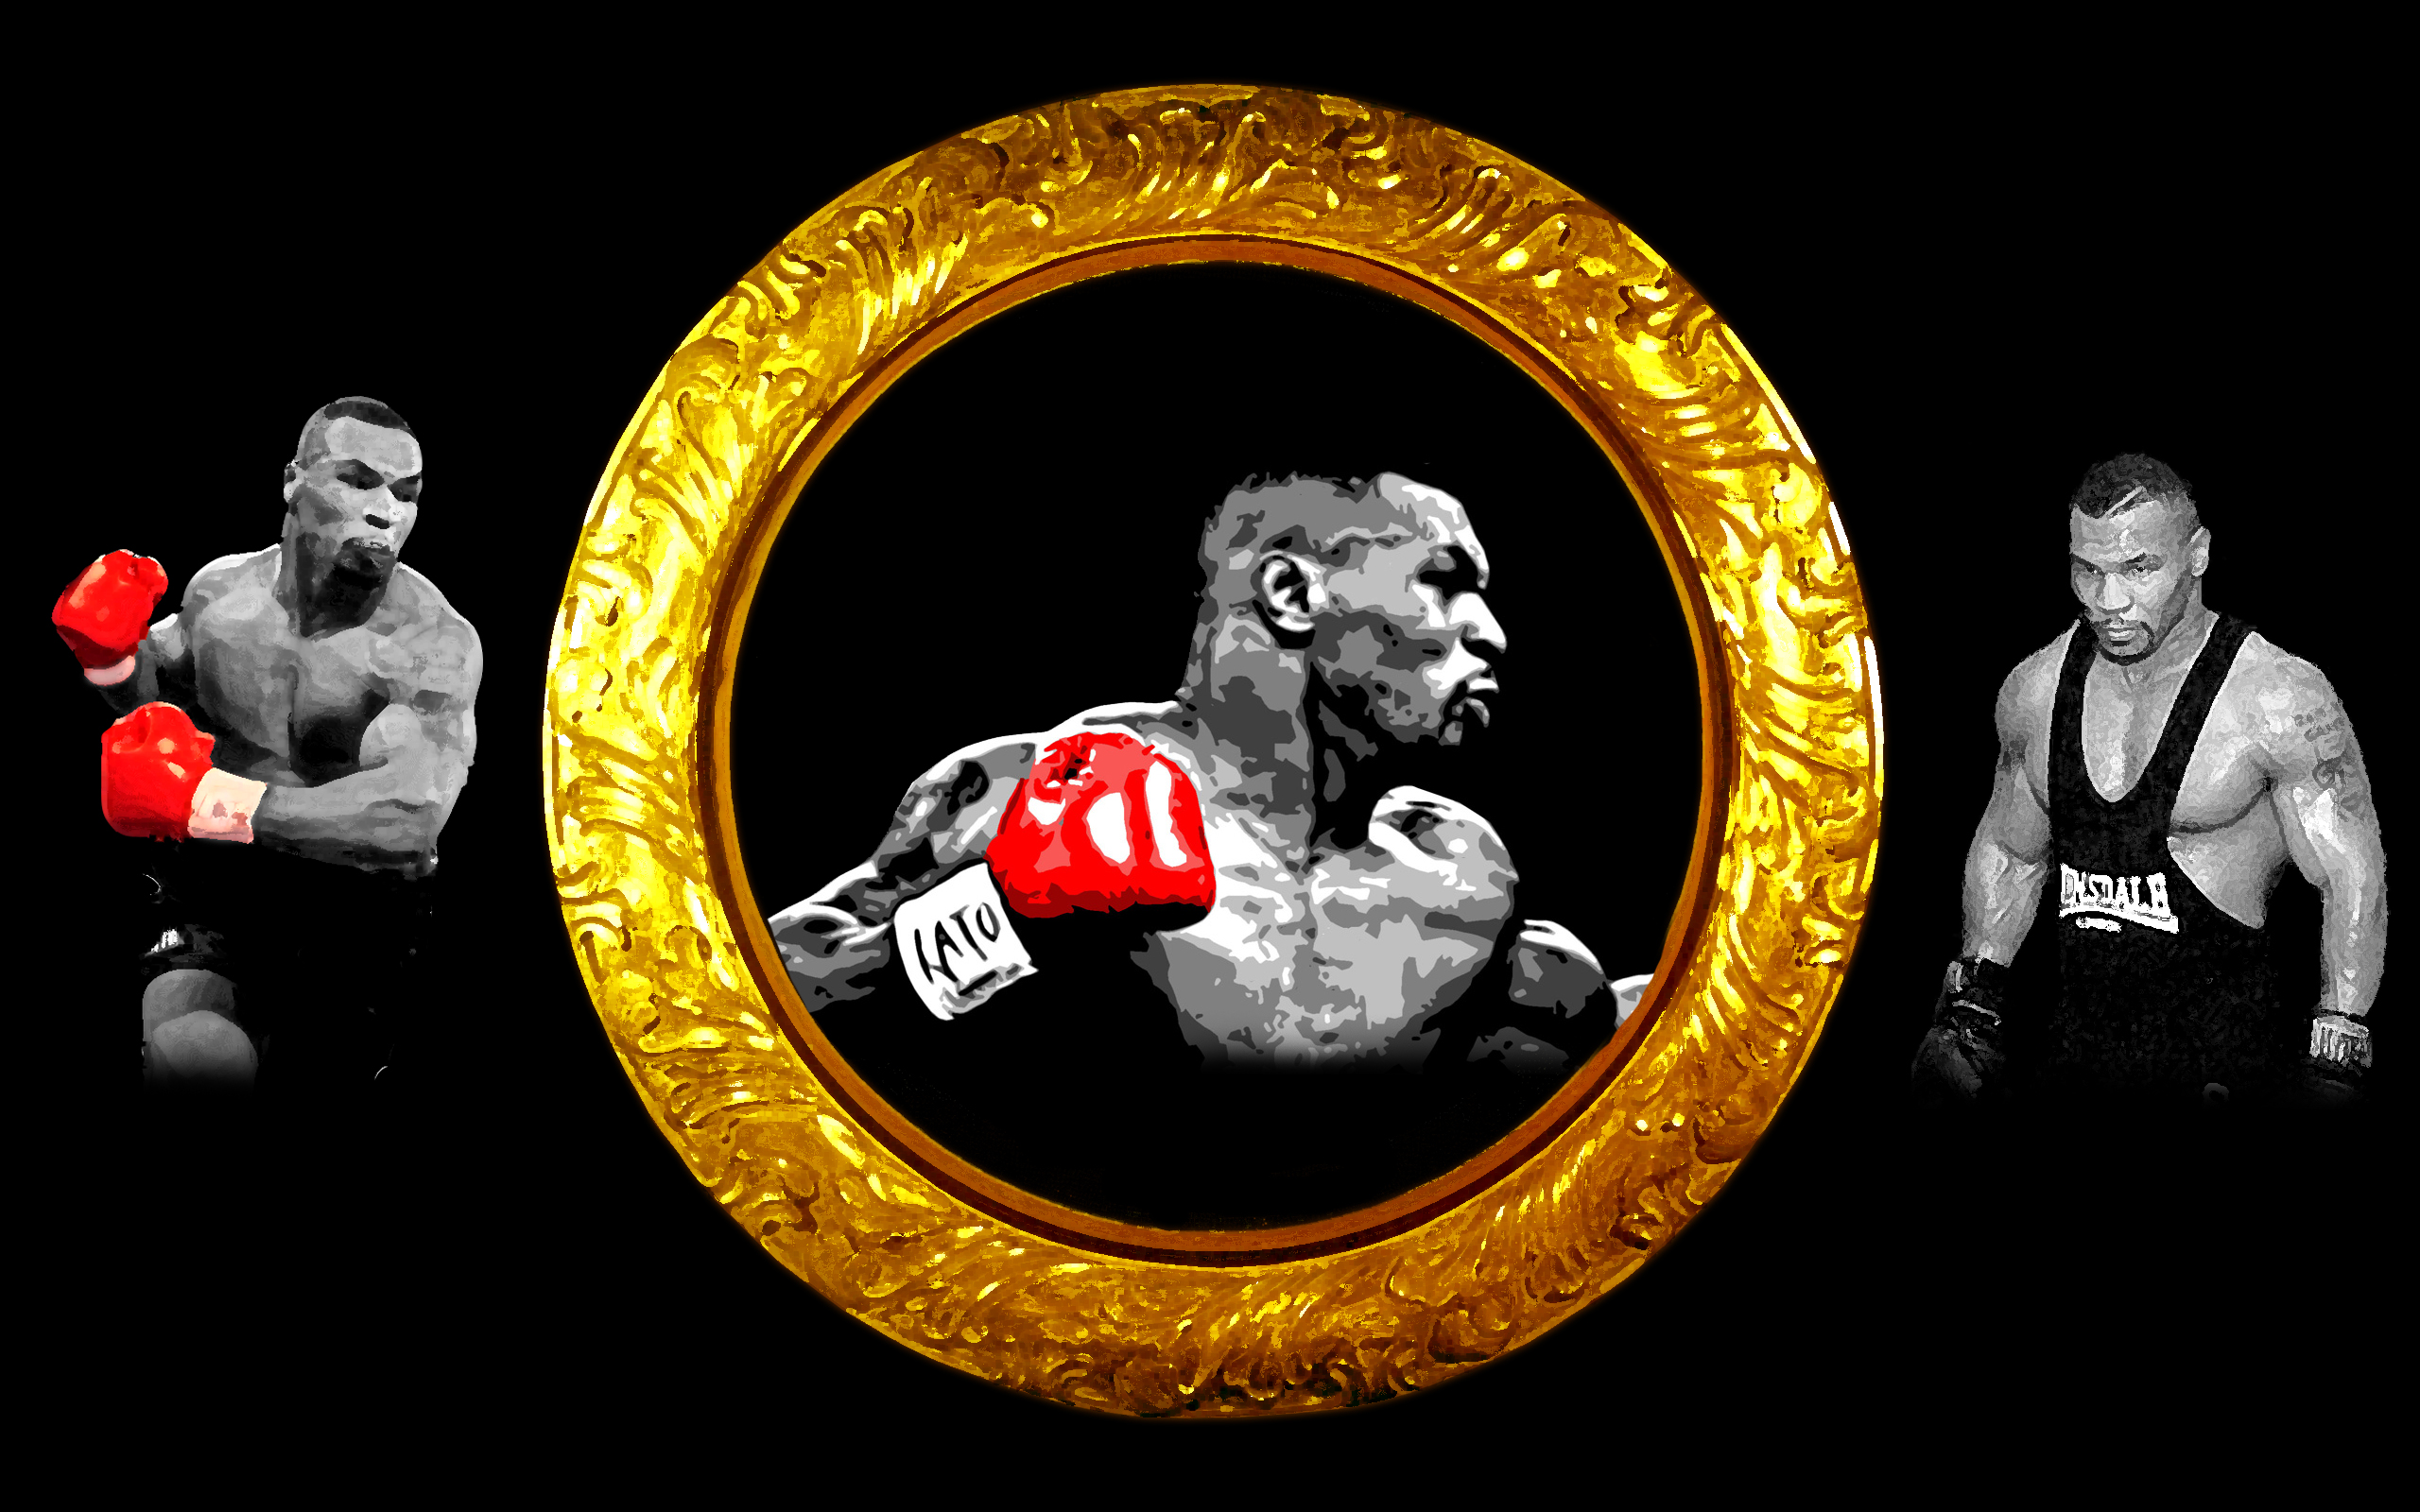 Бокс картинки на аватарку, бесплатные ...: pictures11.ru/boks-kartinki-na-avatarku.html